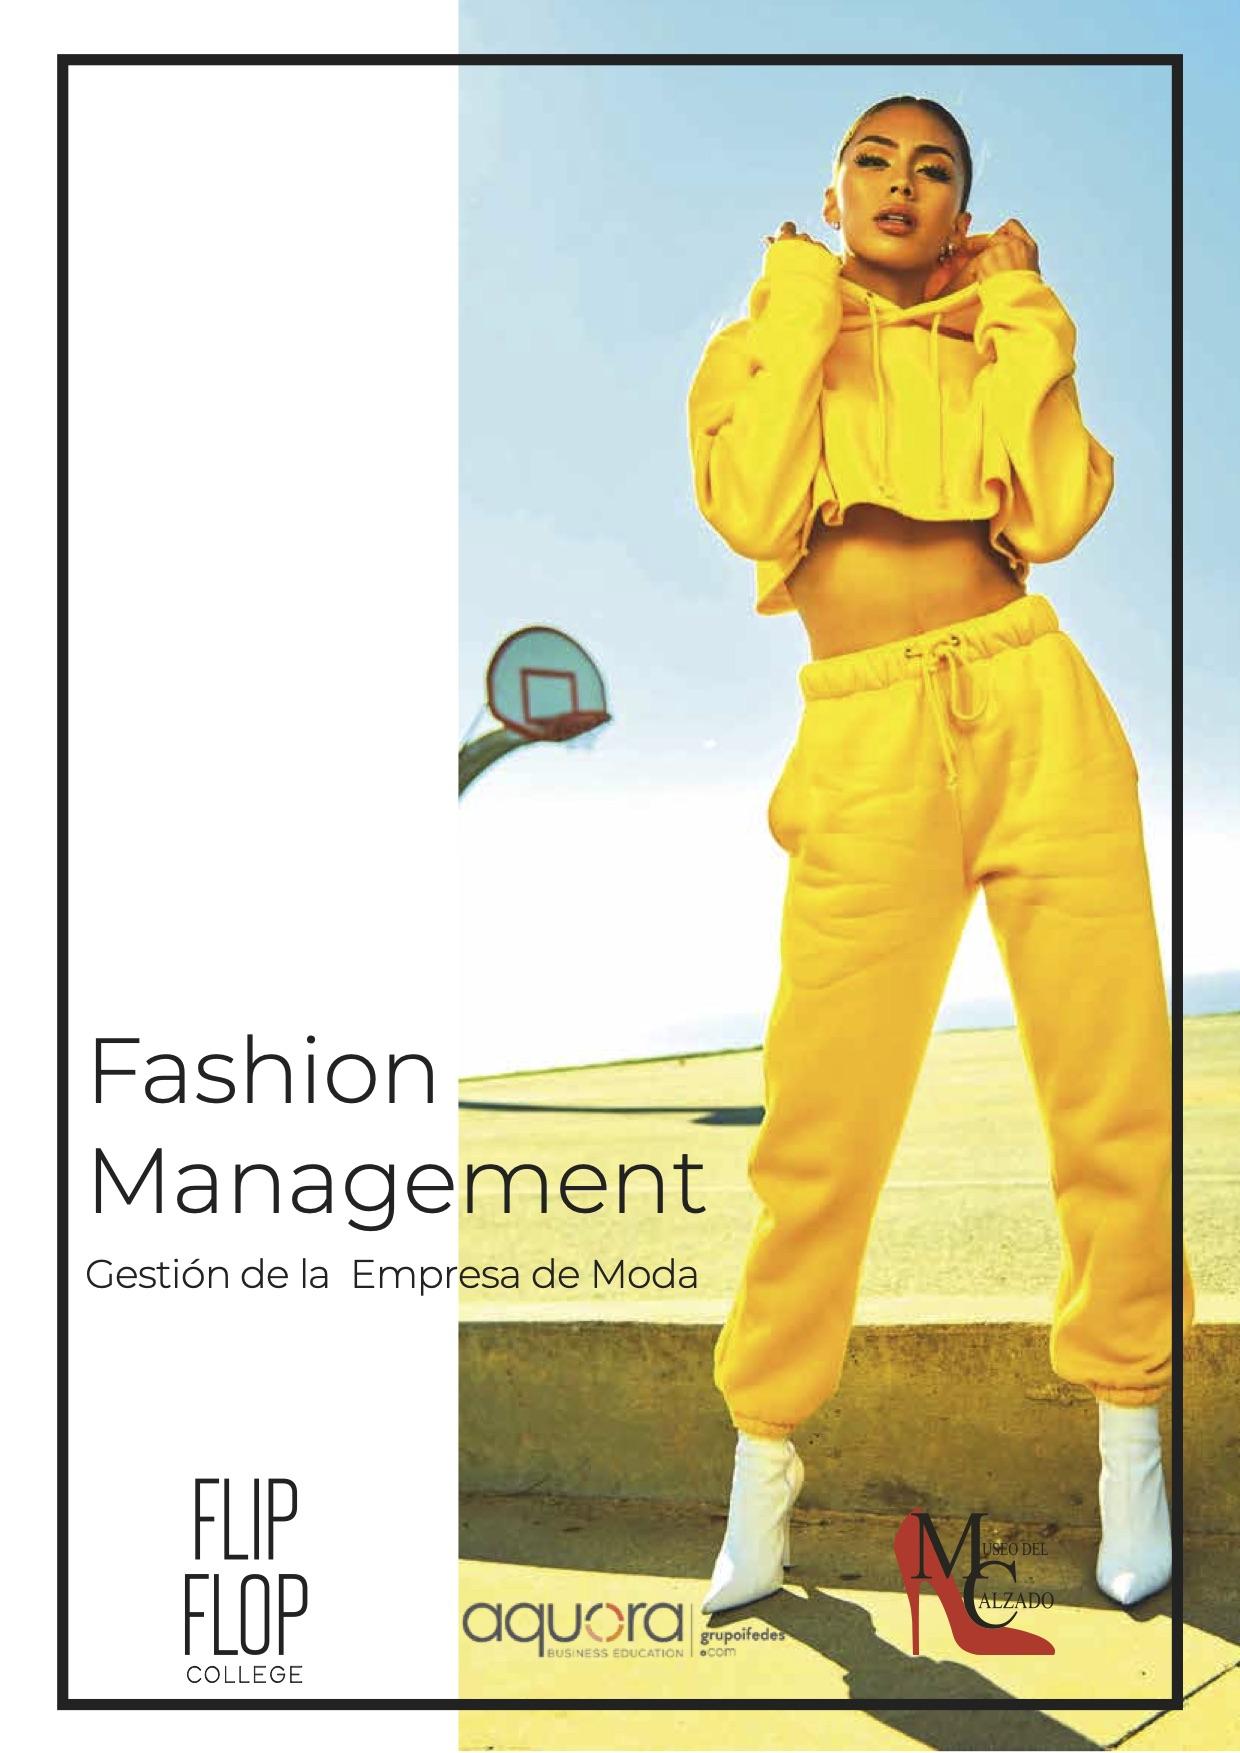 fashion-management-flip-flop-college